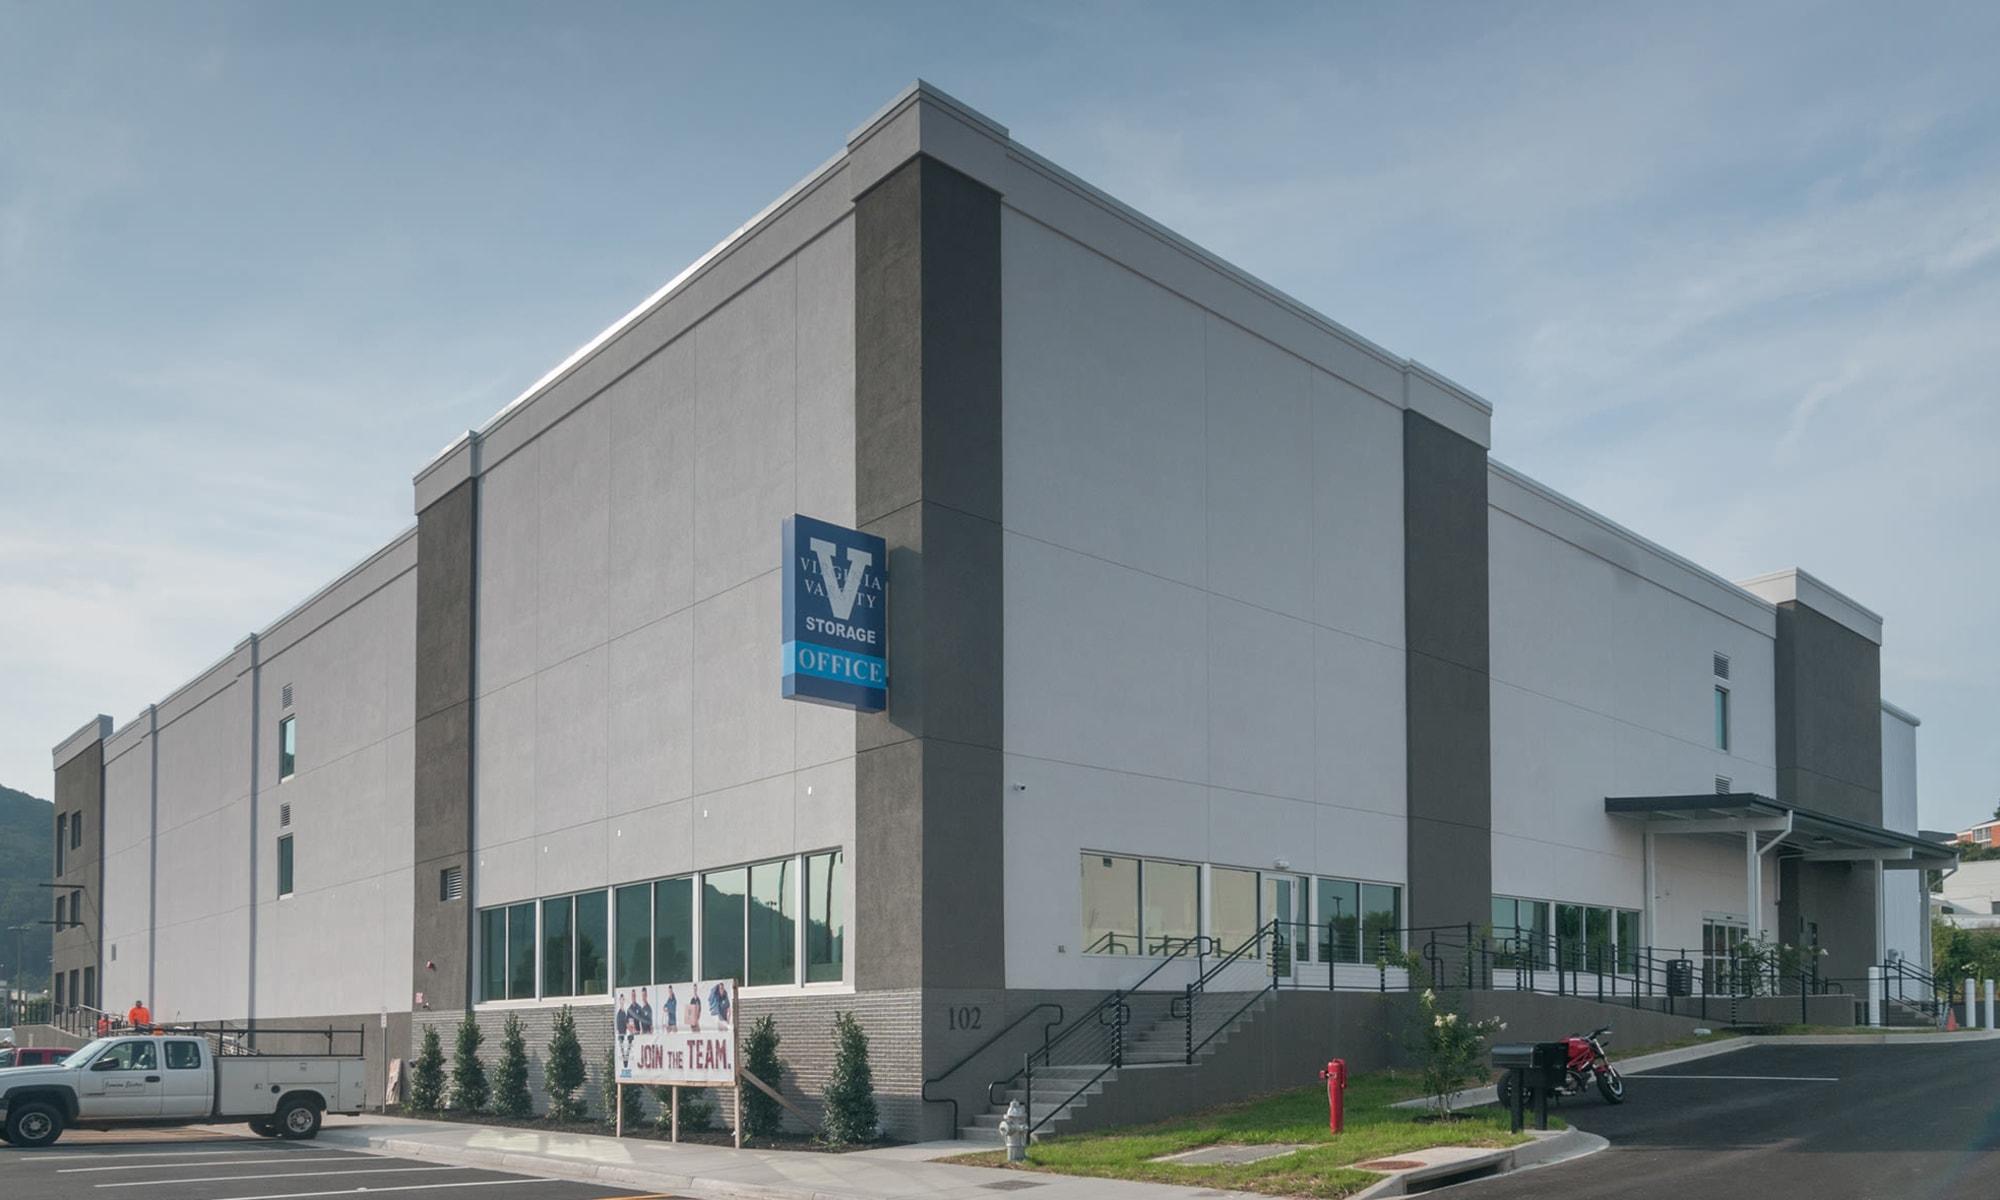 Entrance at Virginia Varsity Storage in Roanoke, Virginia